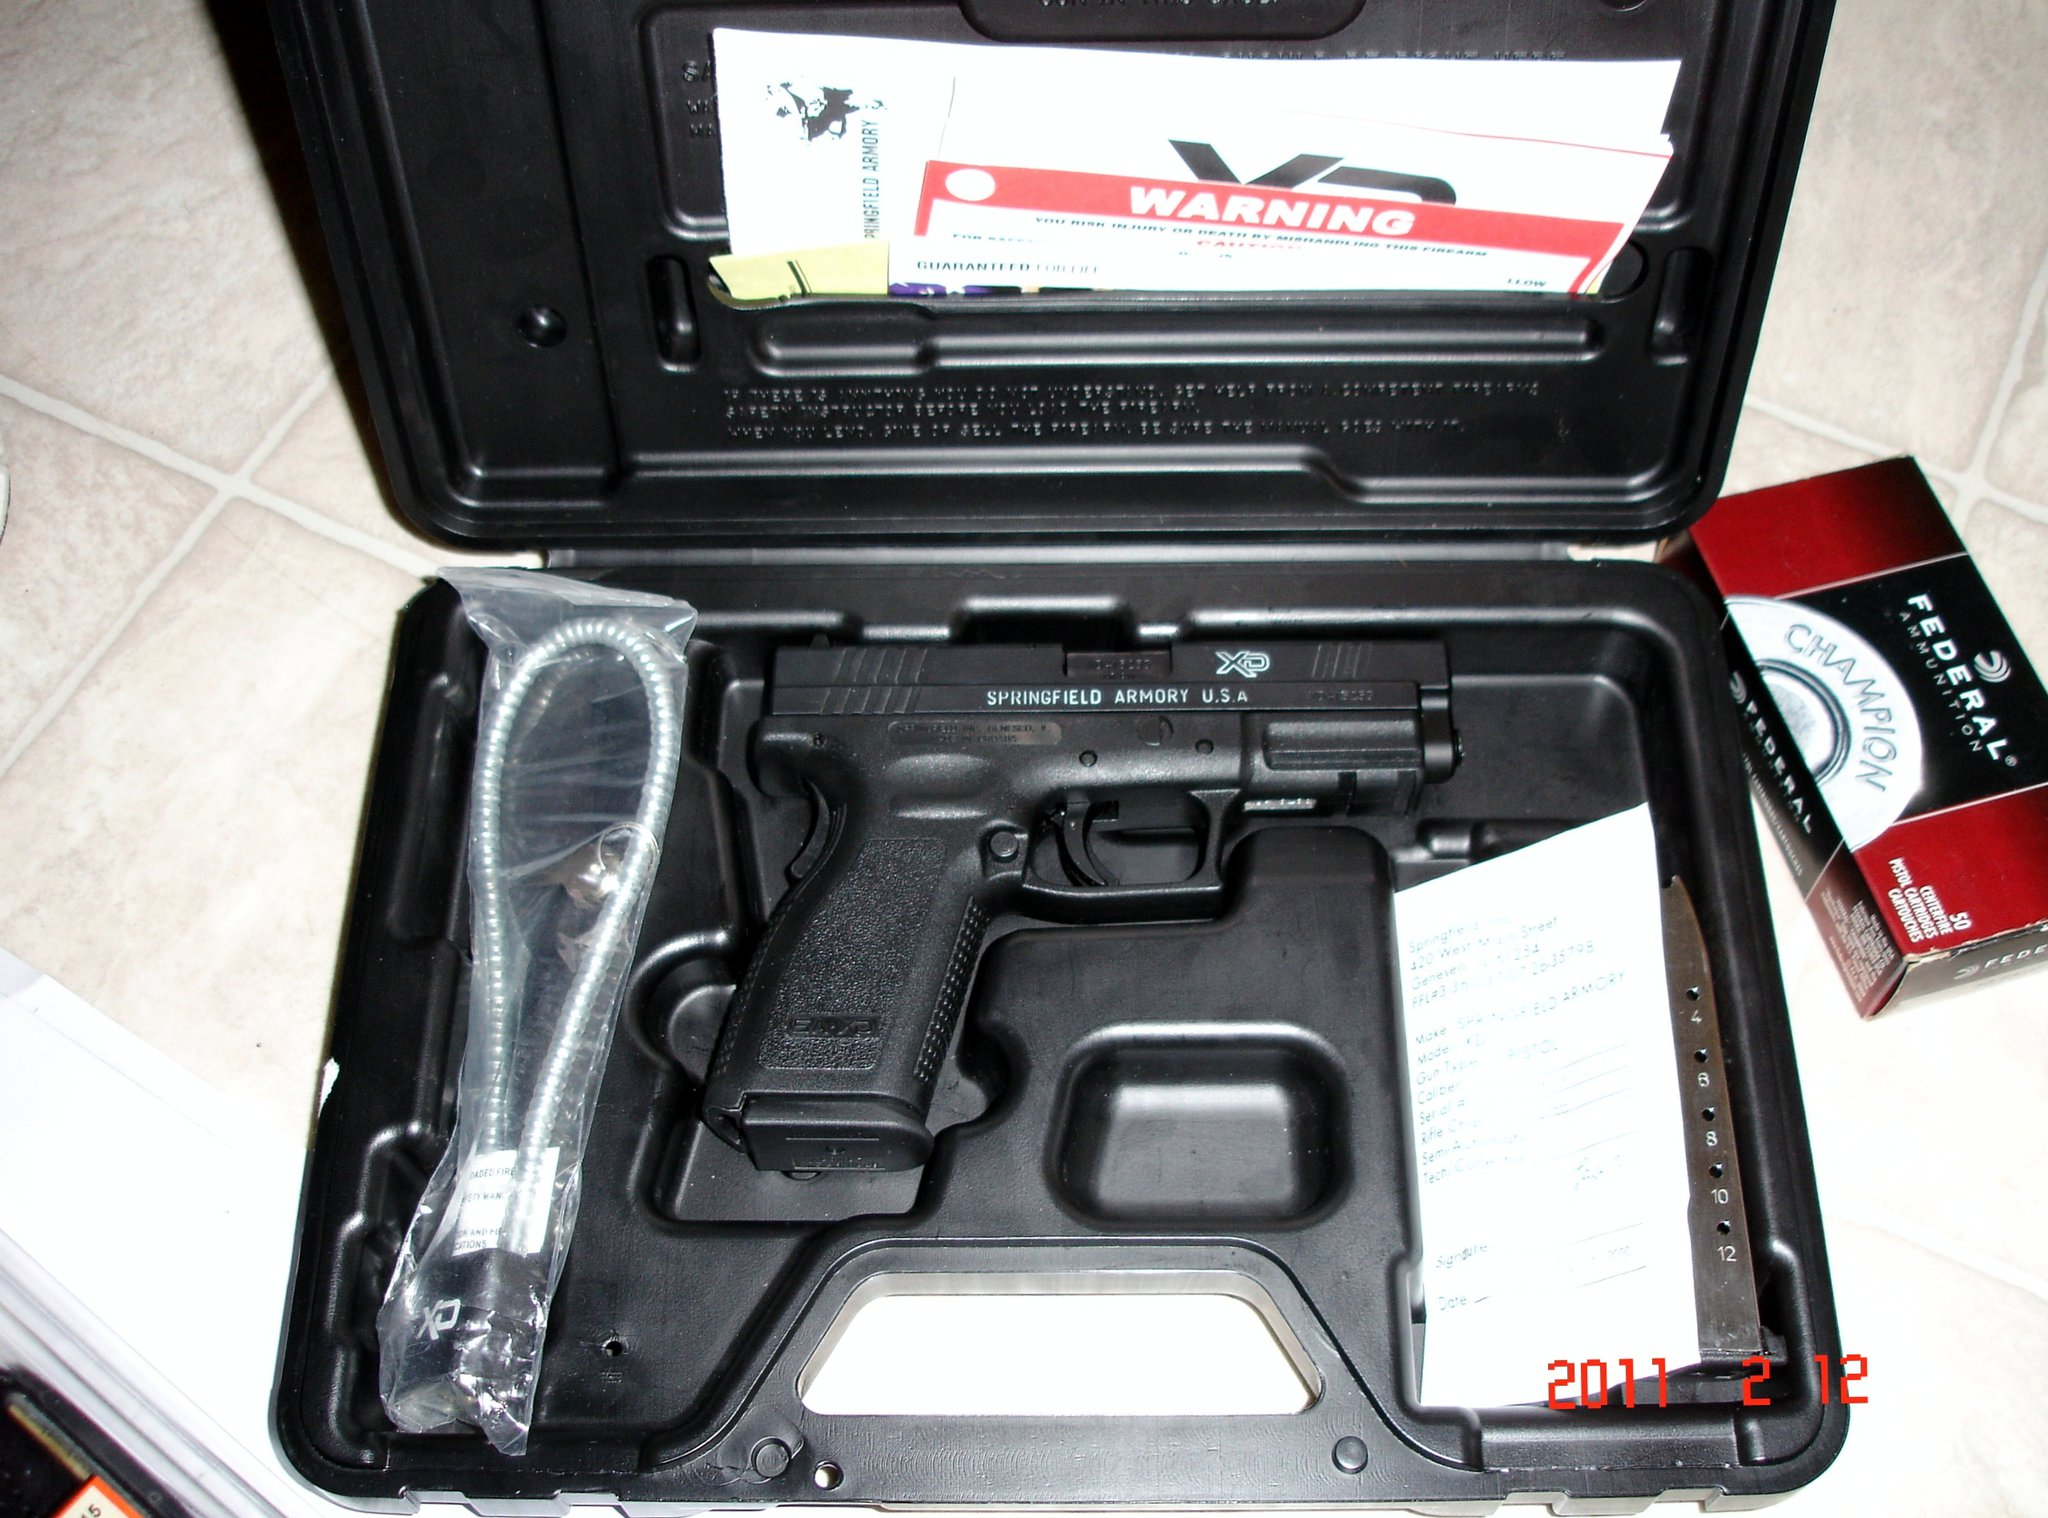 FS/FT Springfield XD-40 X-Tream Duty - XD9102HC - Kentucky-xd40-2-.jpg